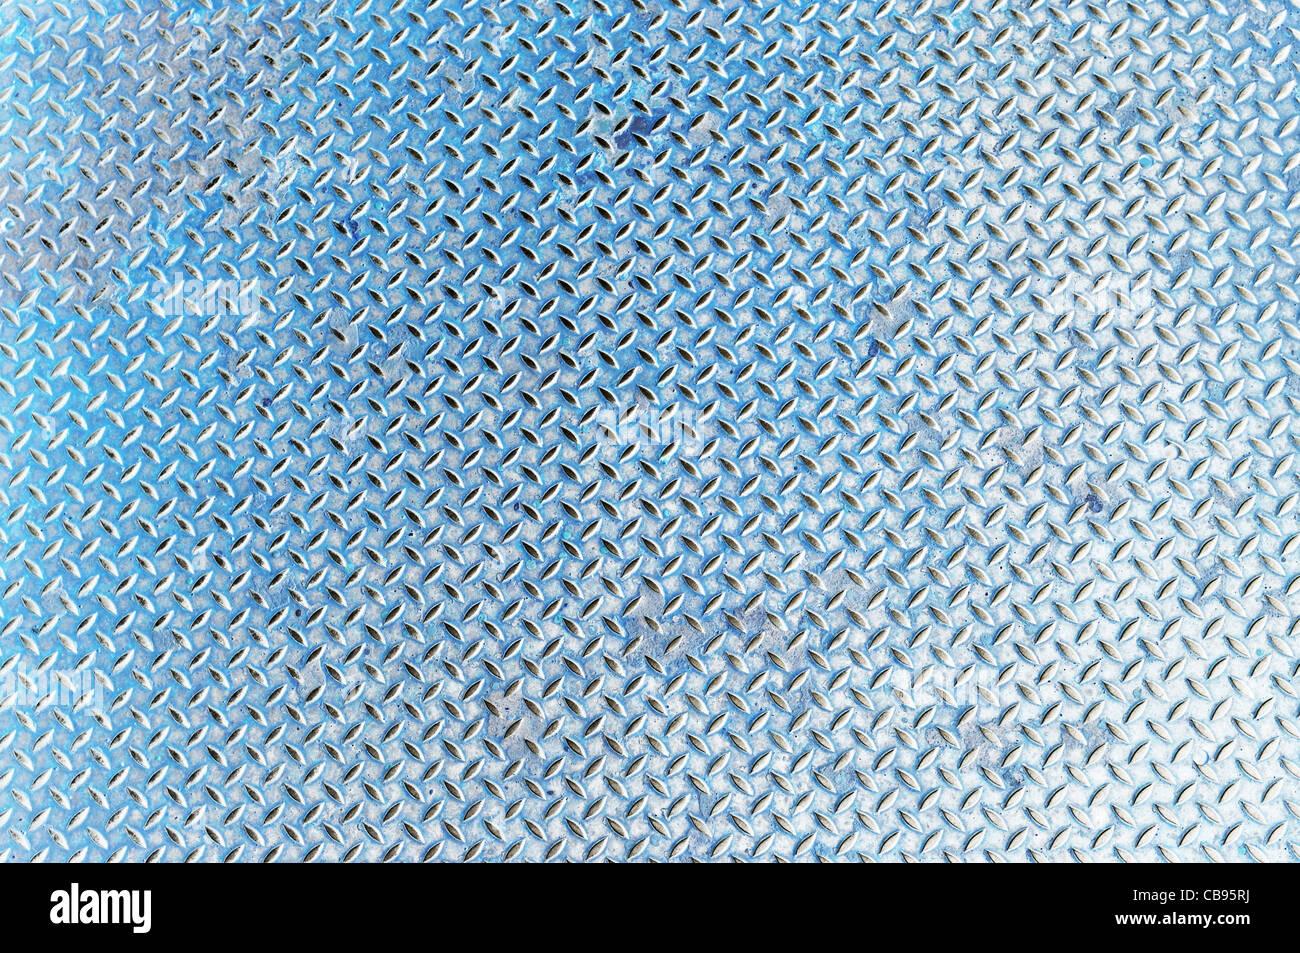 Textura de fondo metálico Imagen De Stock